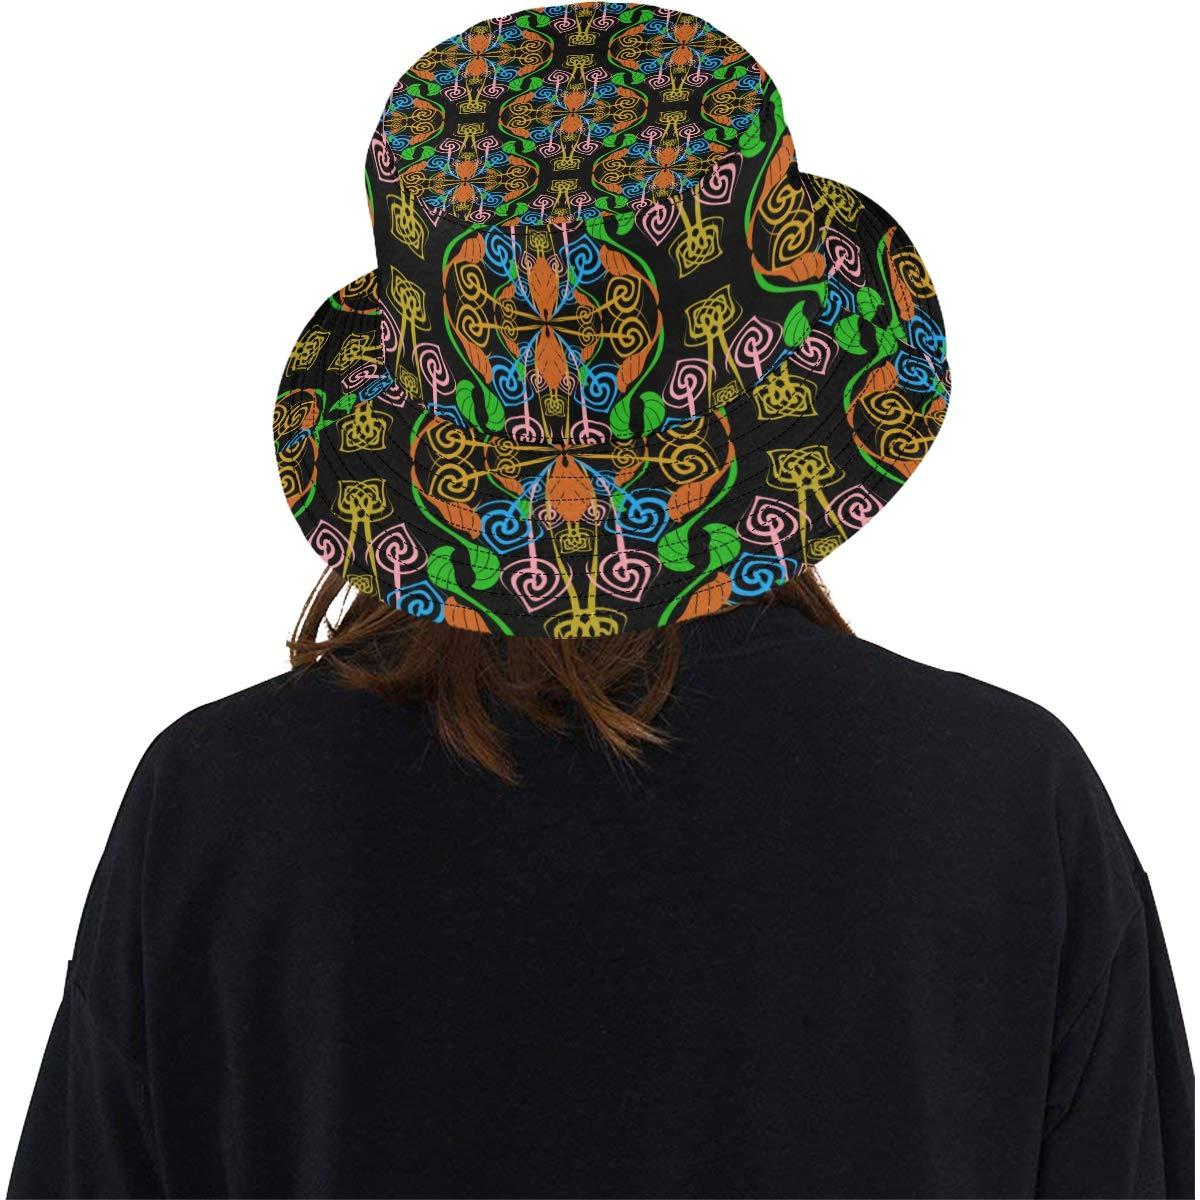 Spirals Ethnic Geometric Summer Unisex Fishing Sun Top Bucket Hats for Kid Teens Women and Men with Packable Fisherman Cap for Outdoor Baseball Sport Picnic